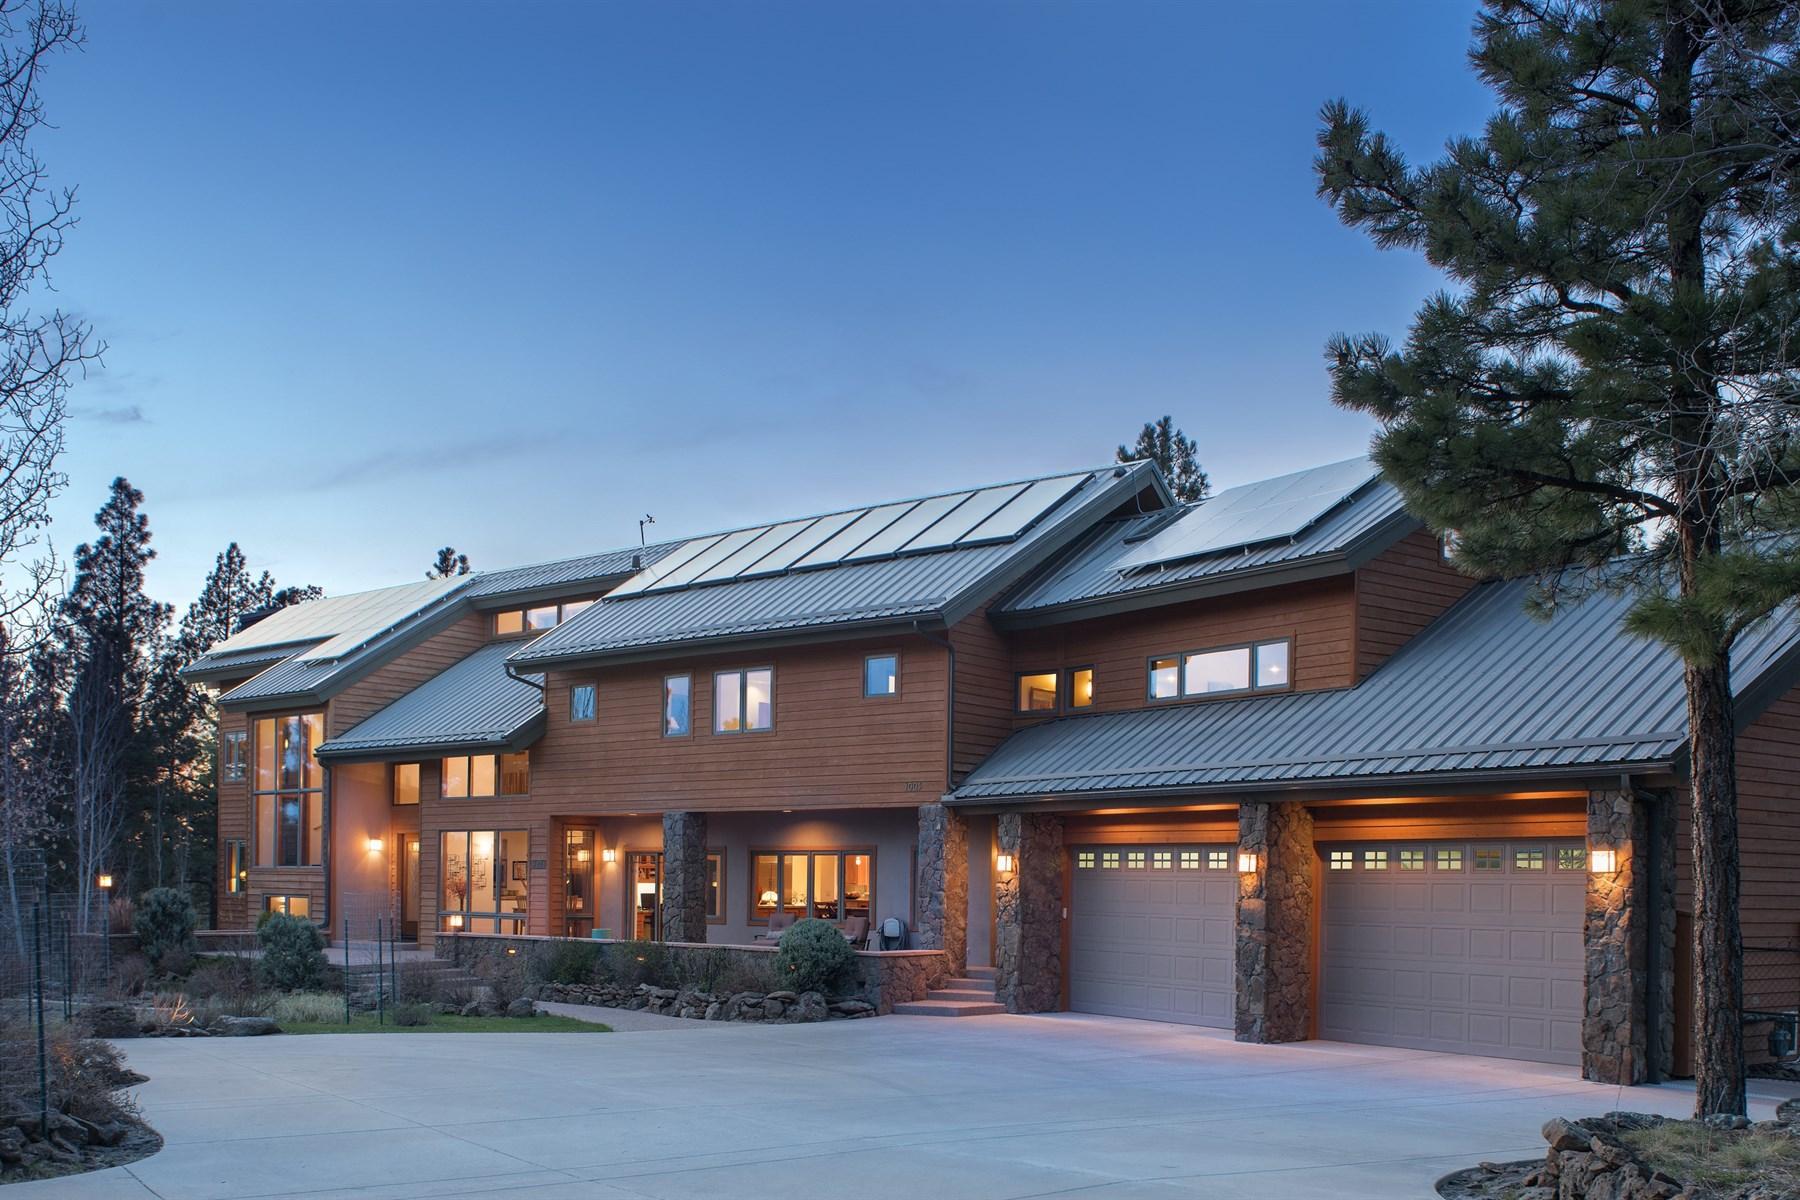 獨棟家庭住宅 為 出售 在 Frank Lloyd Wright inspired home 4005 N Toca Sierra Trl Flagstaff, 亞利桑那州, 86001 美國